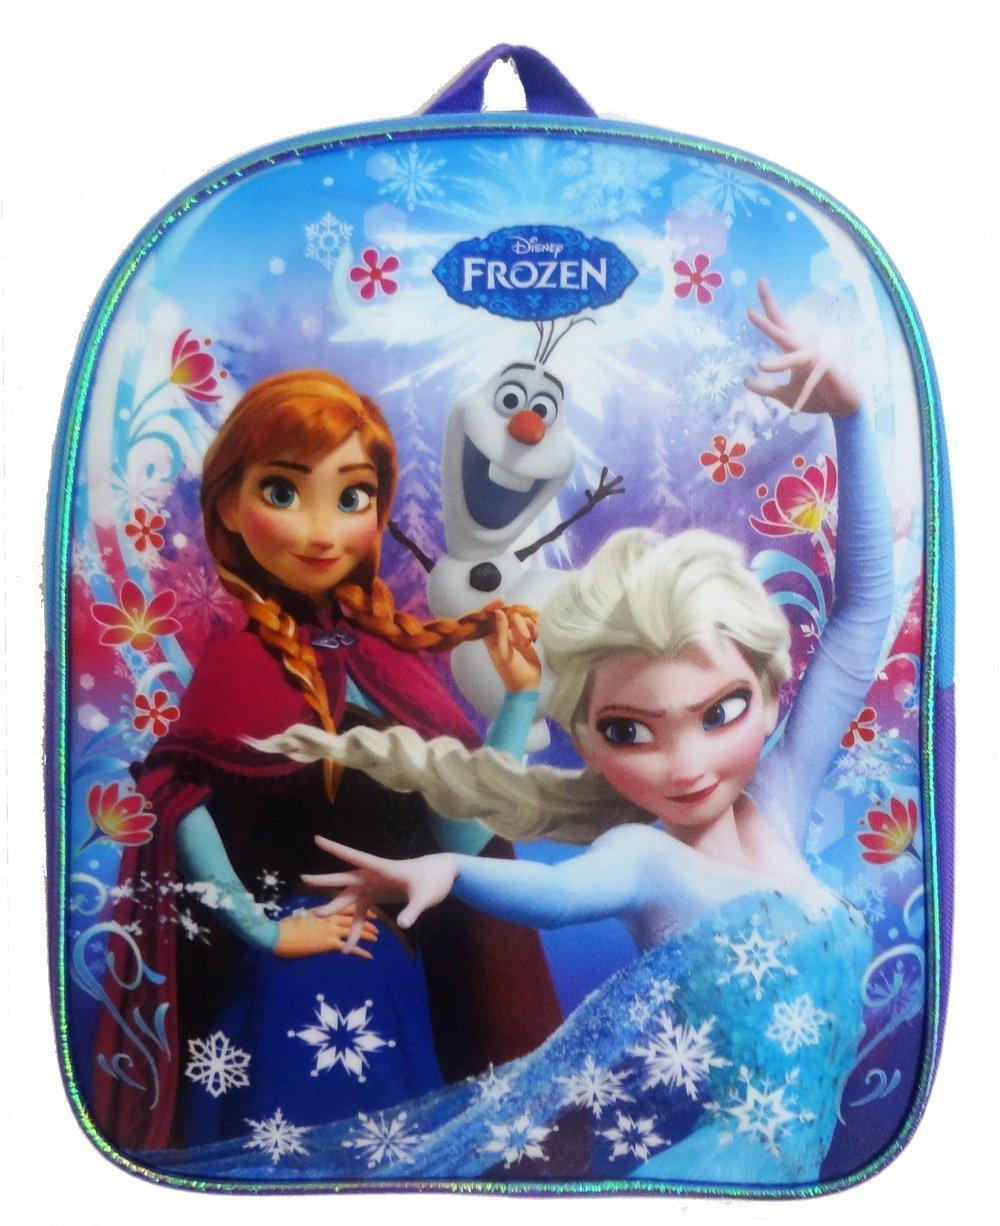 Disney Frozen Mini Backpack Anna Image 1